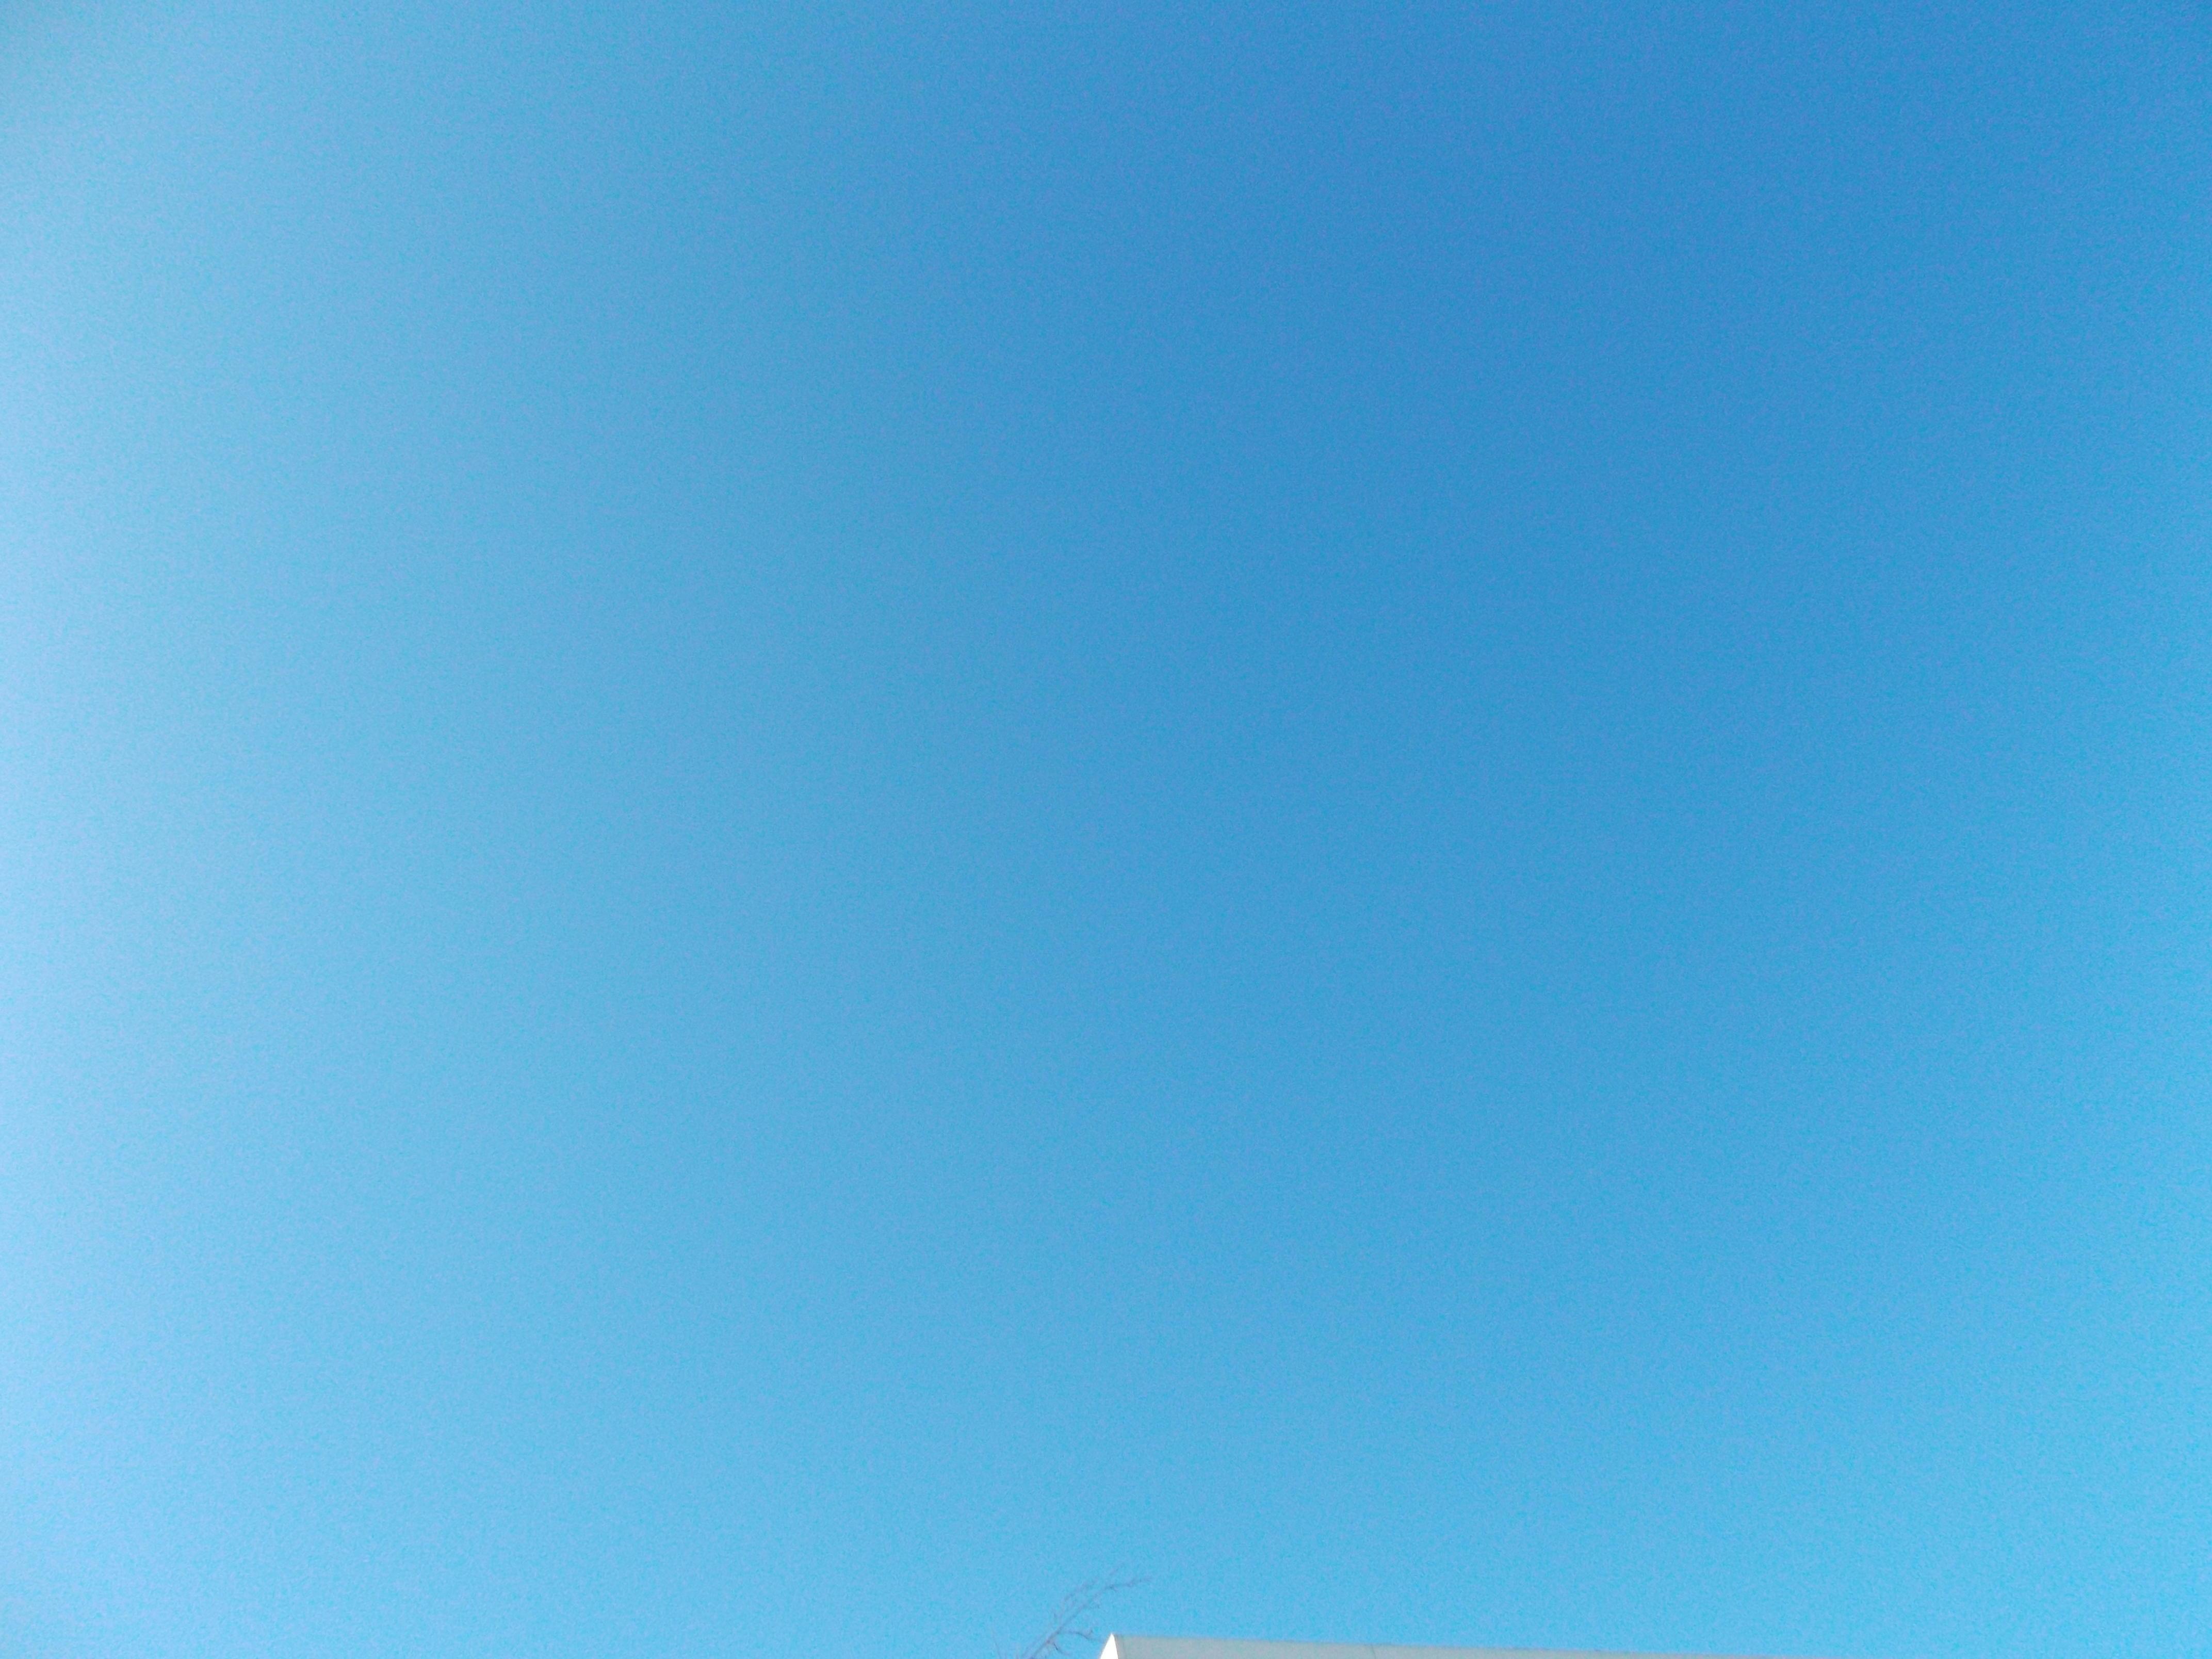 2013-02-16 Longitude -0.371 Latitude 49.182 Altitude 13 Heure 12h55